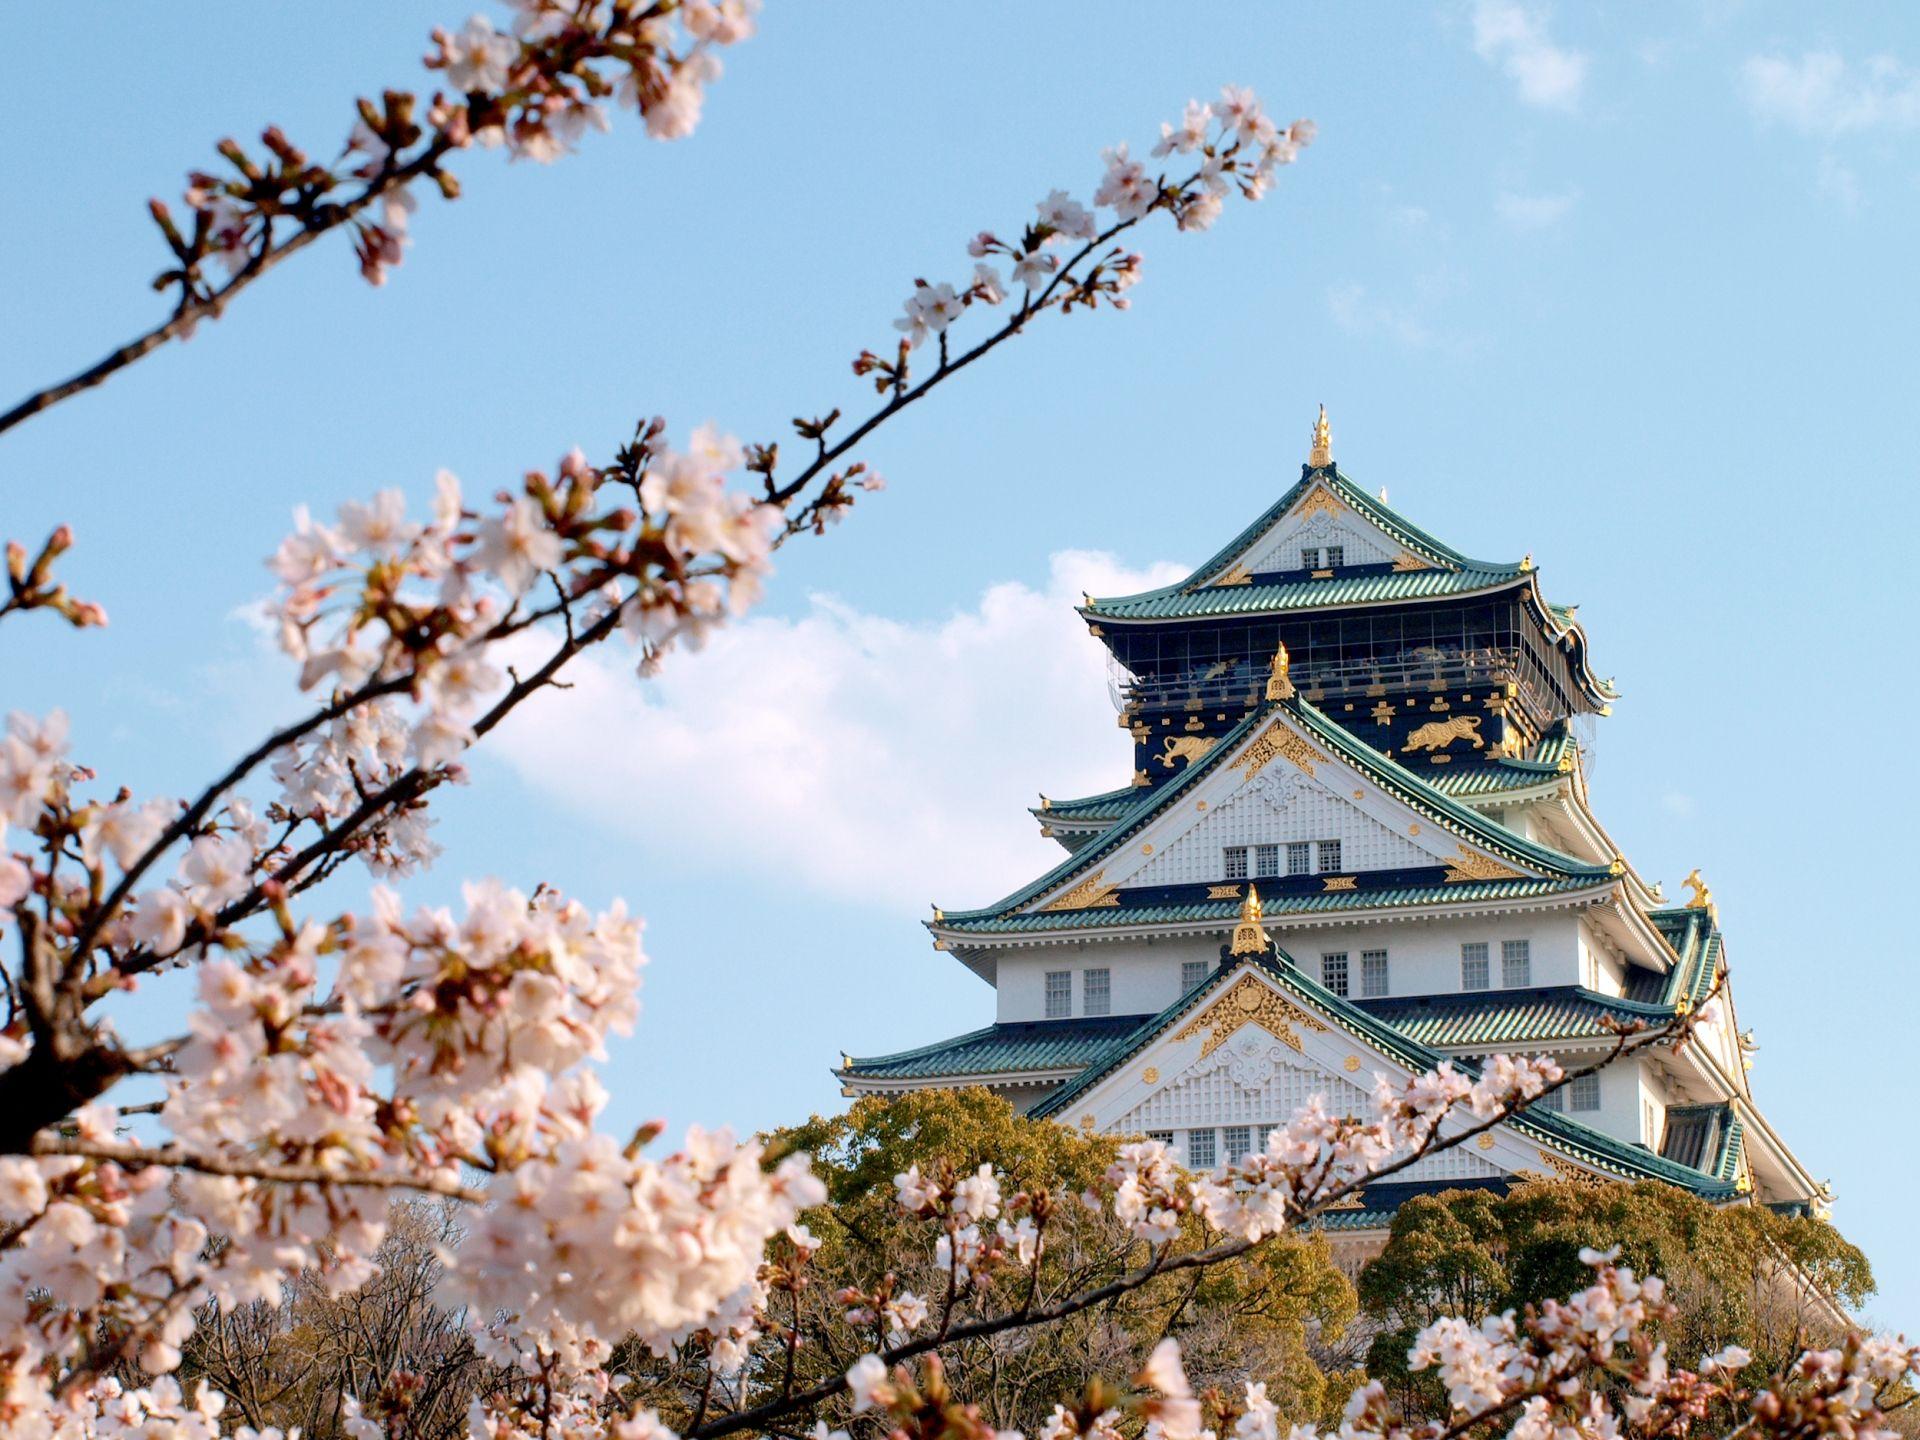 OSAKA – KYOTO – NÚI PHÚ SĨ – TOKYO (AIR MACAU)